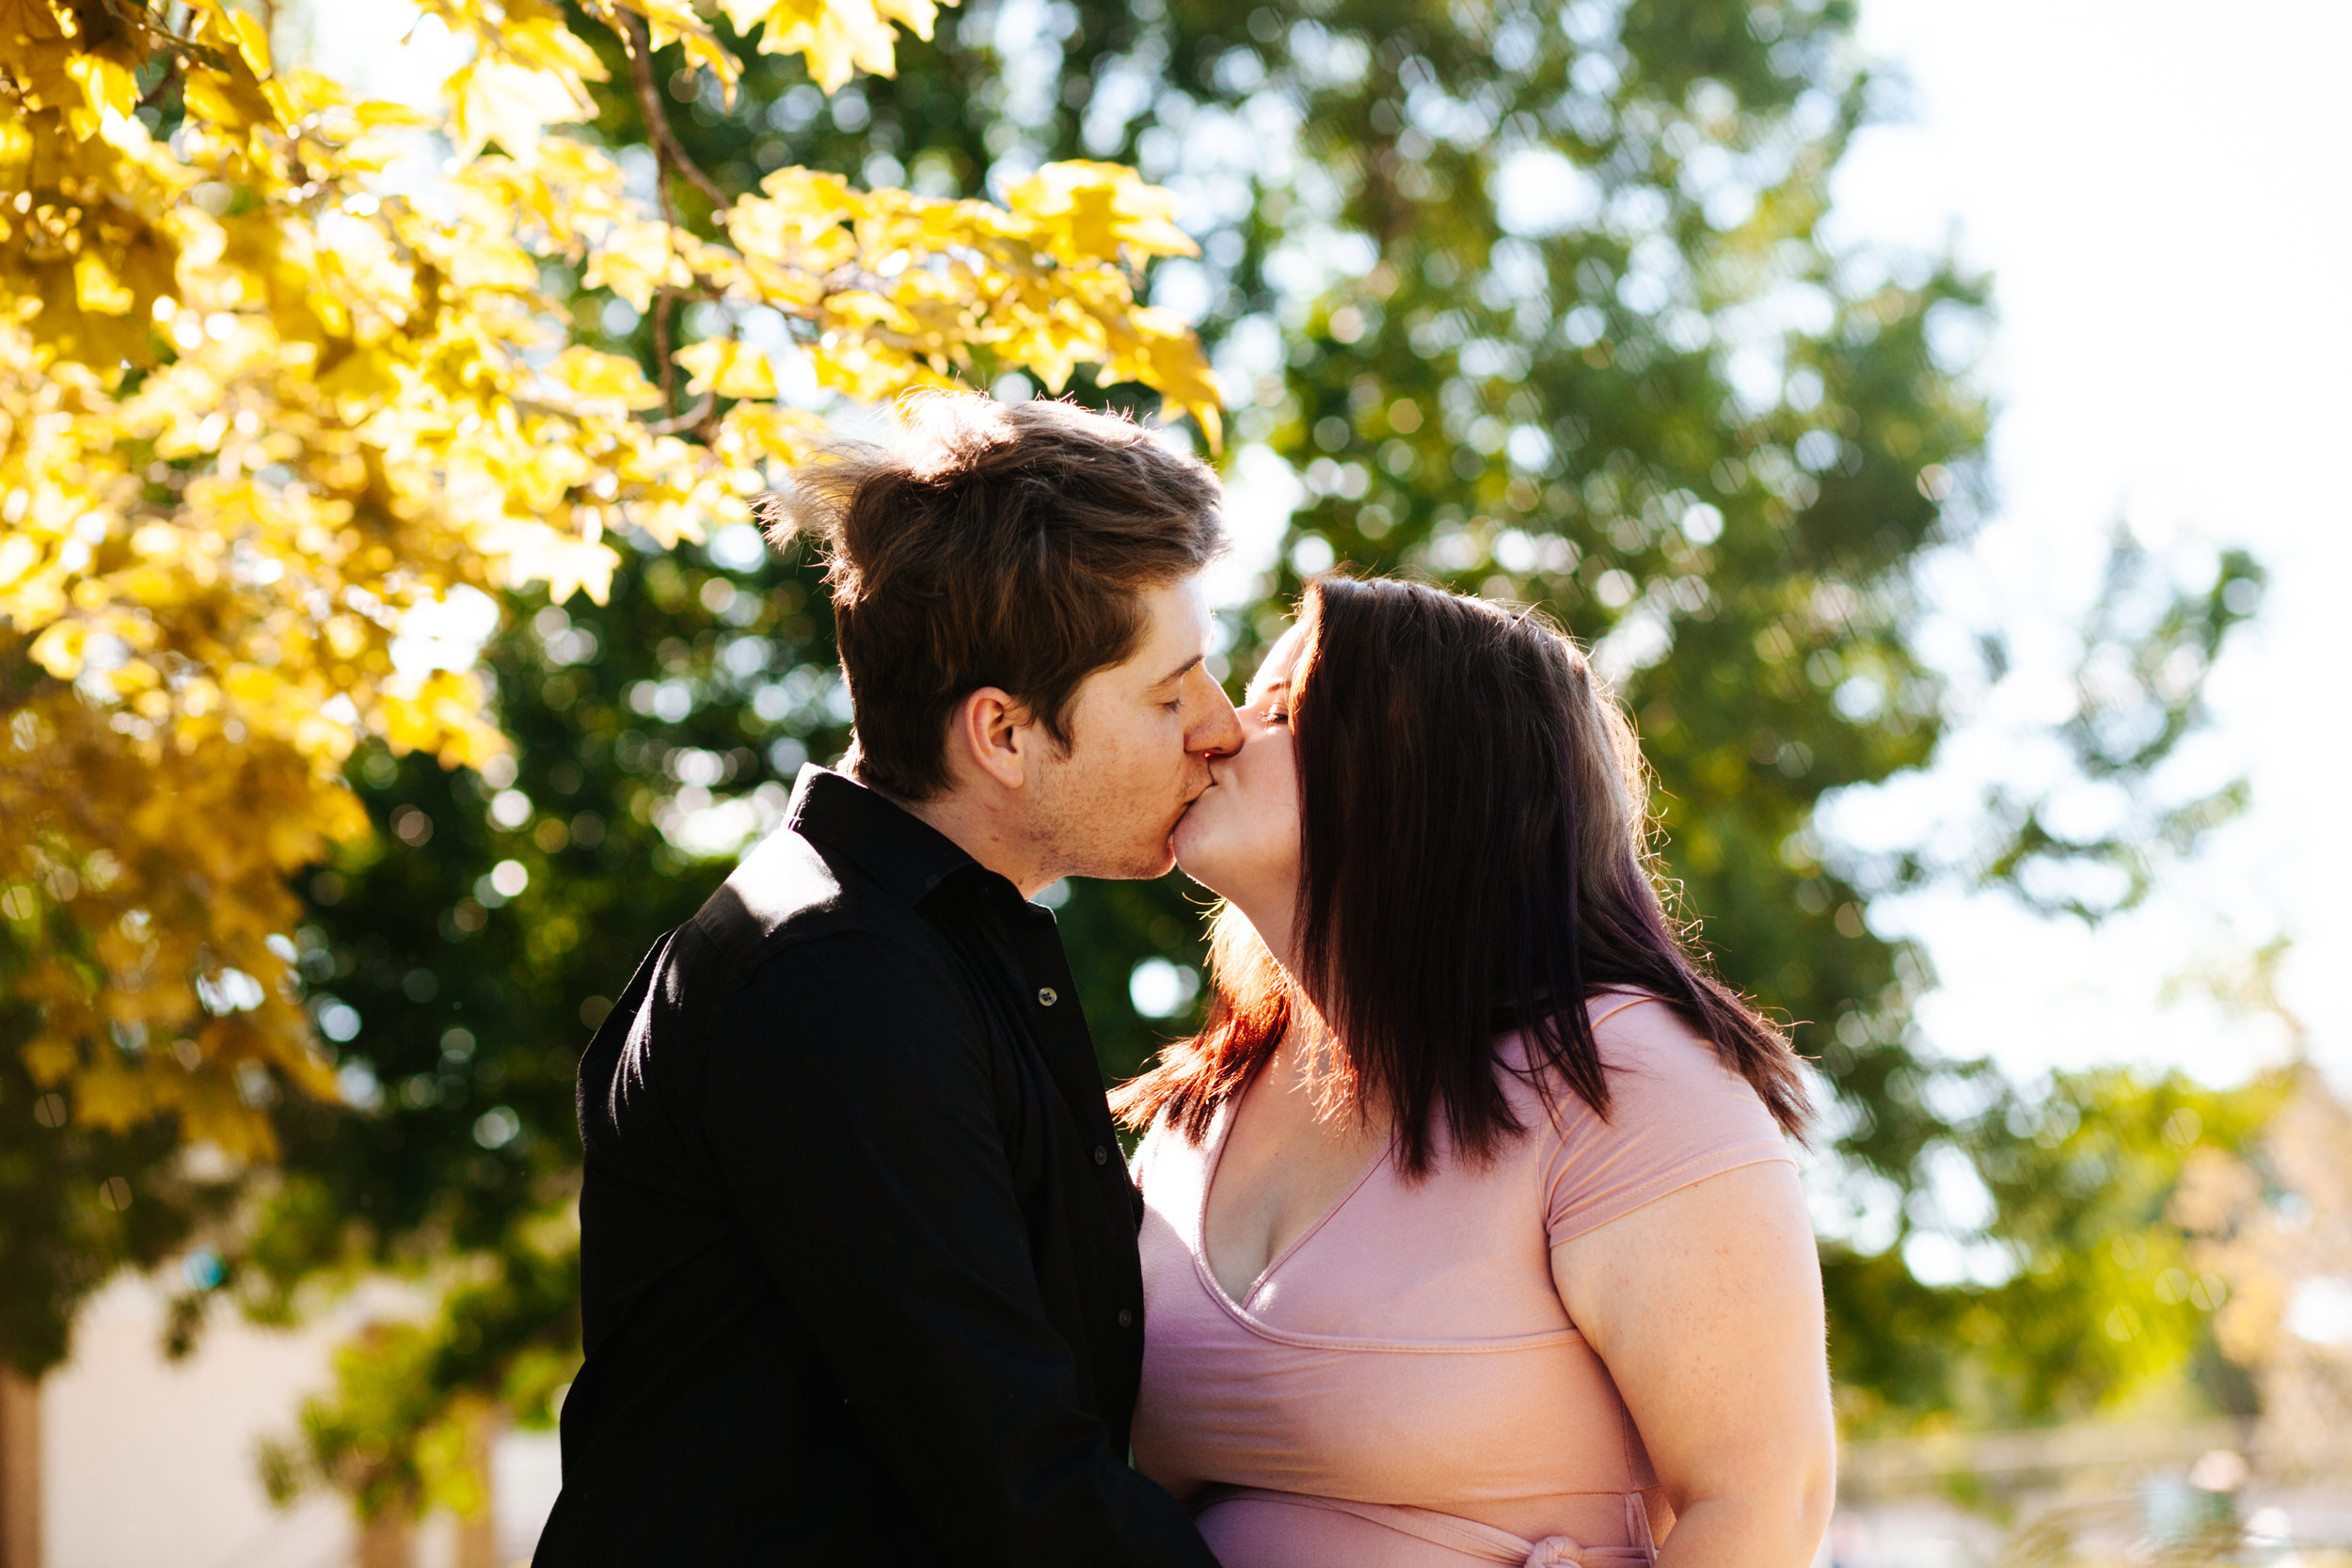 +Liberty Park +Utah Engagement Session +Salt Lake City Engagement Photographer +Utah Wedding Photographer +Marina Rey Photo-9710.jpg